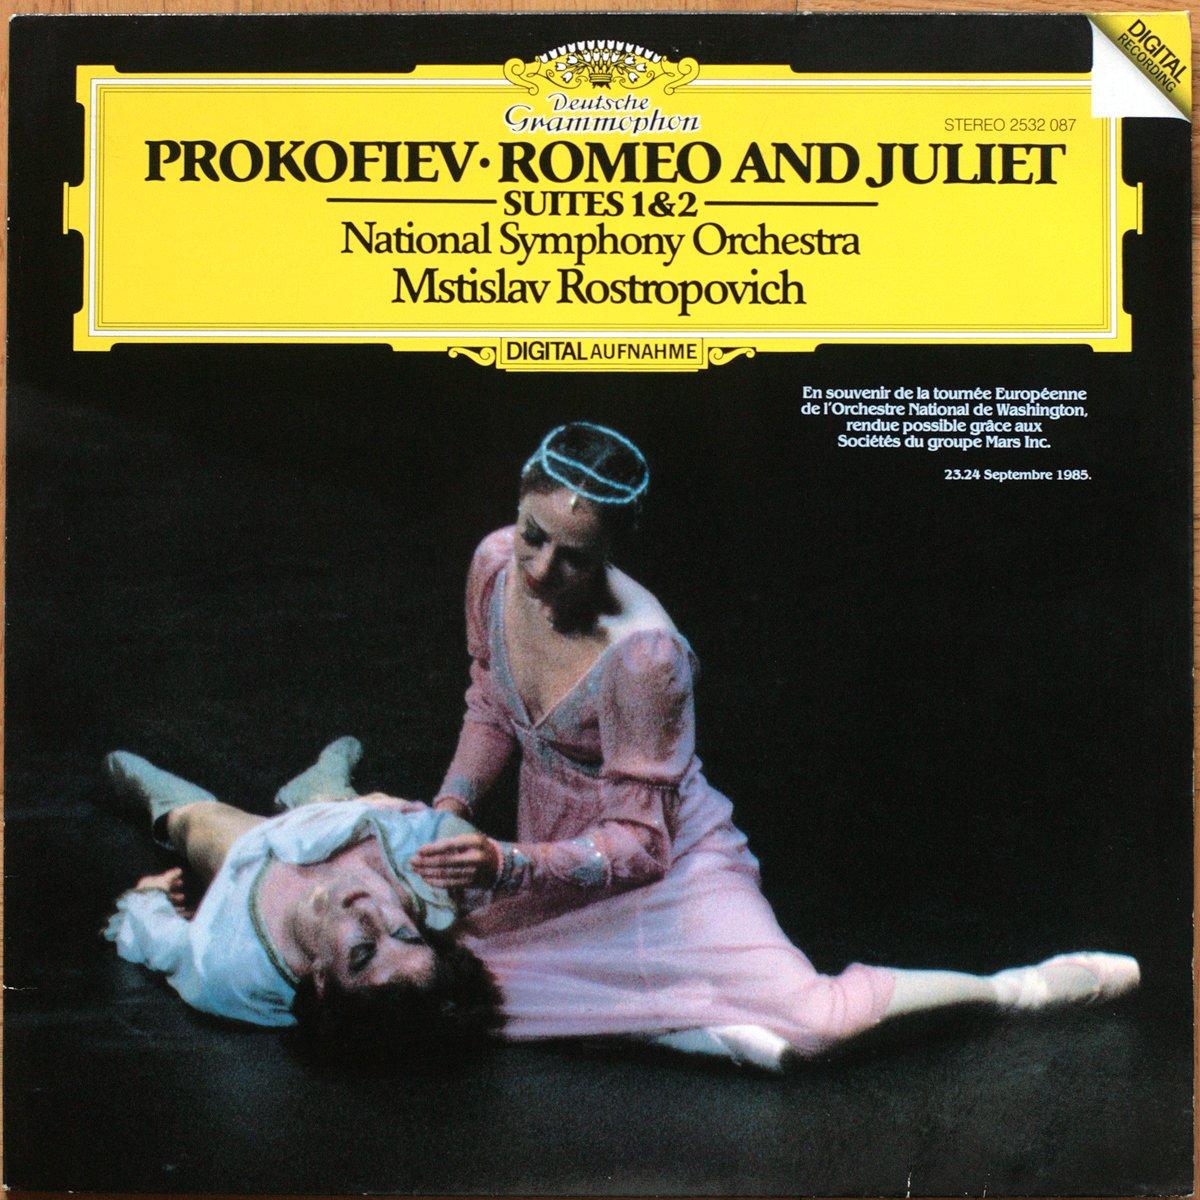 DGG 2532087 Prokofiev Romeo Juliette Rostropovich